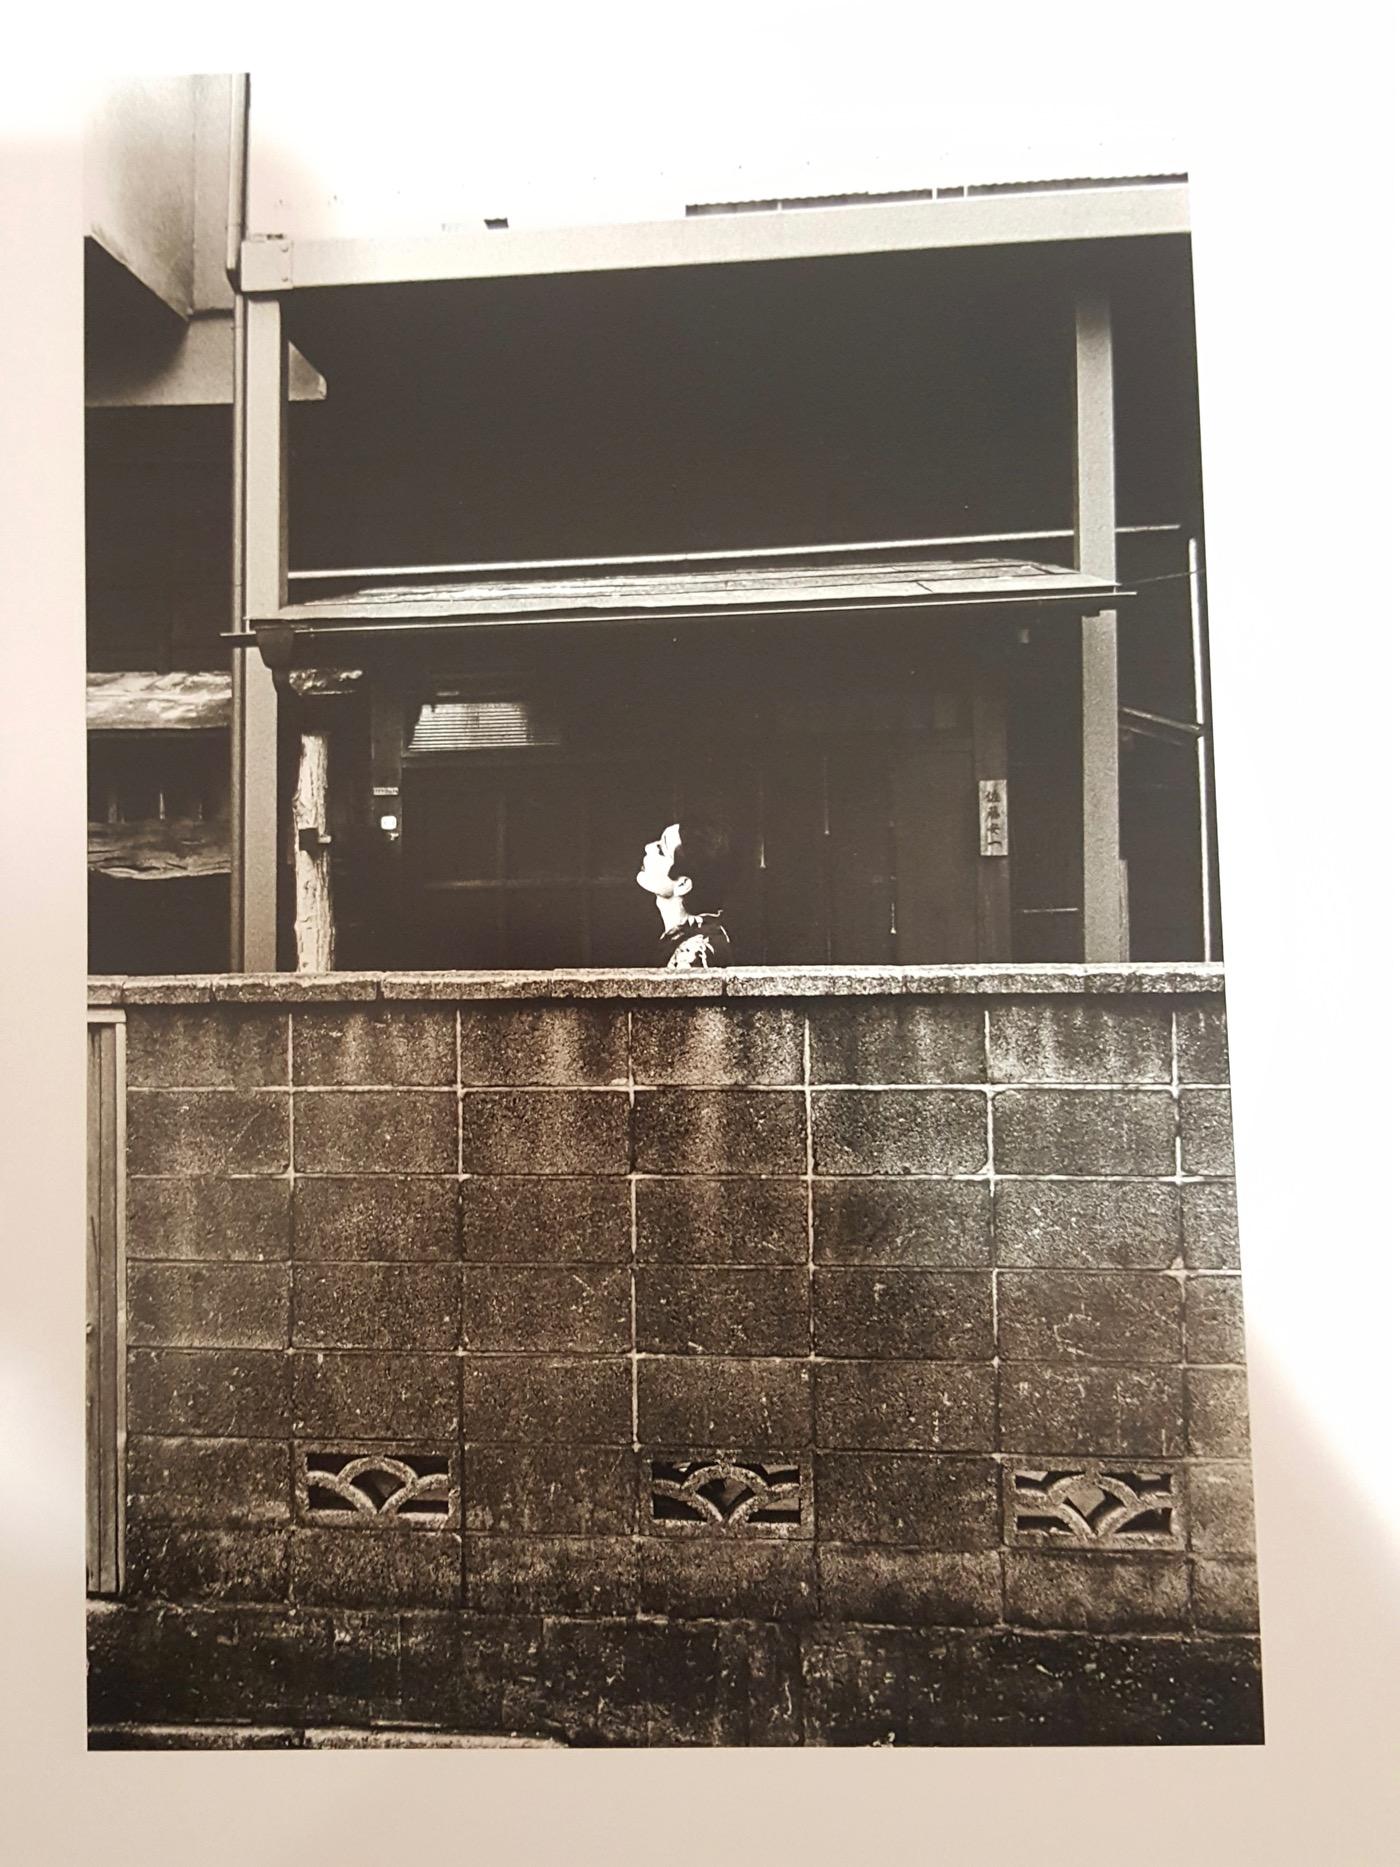 Simmon: A Private Landscape by Eikoh Hosoe